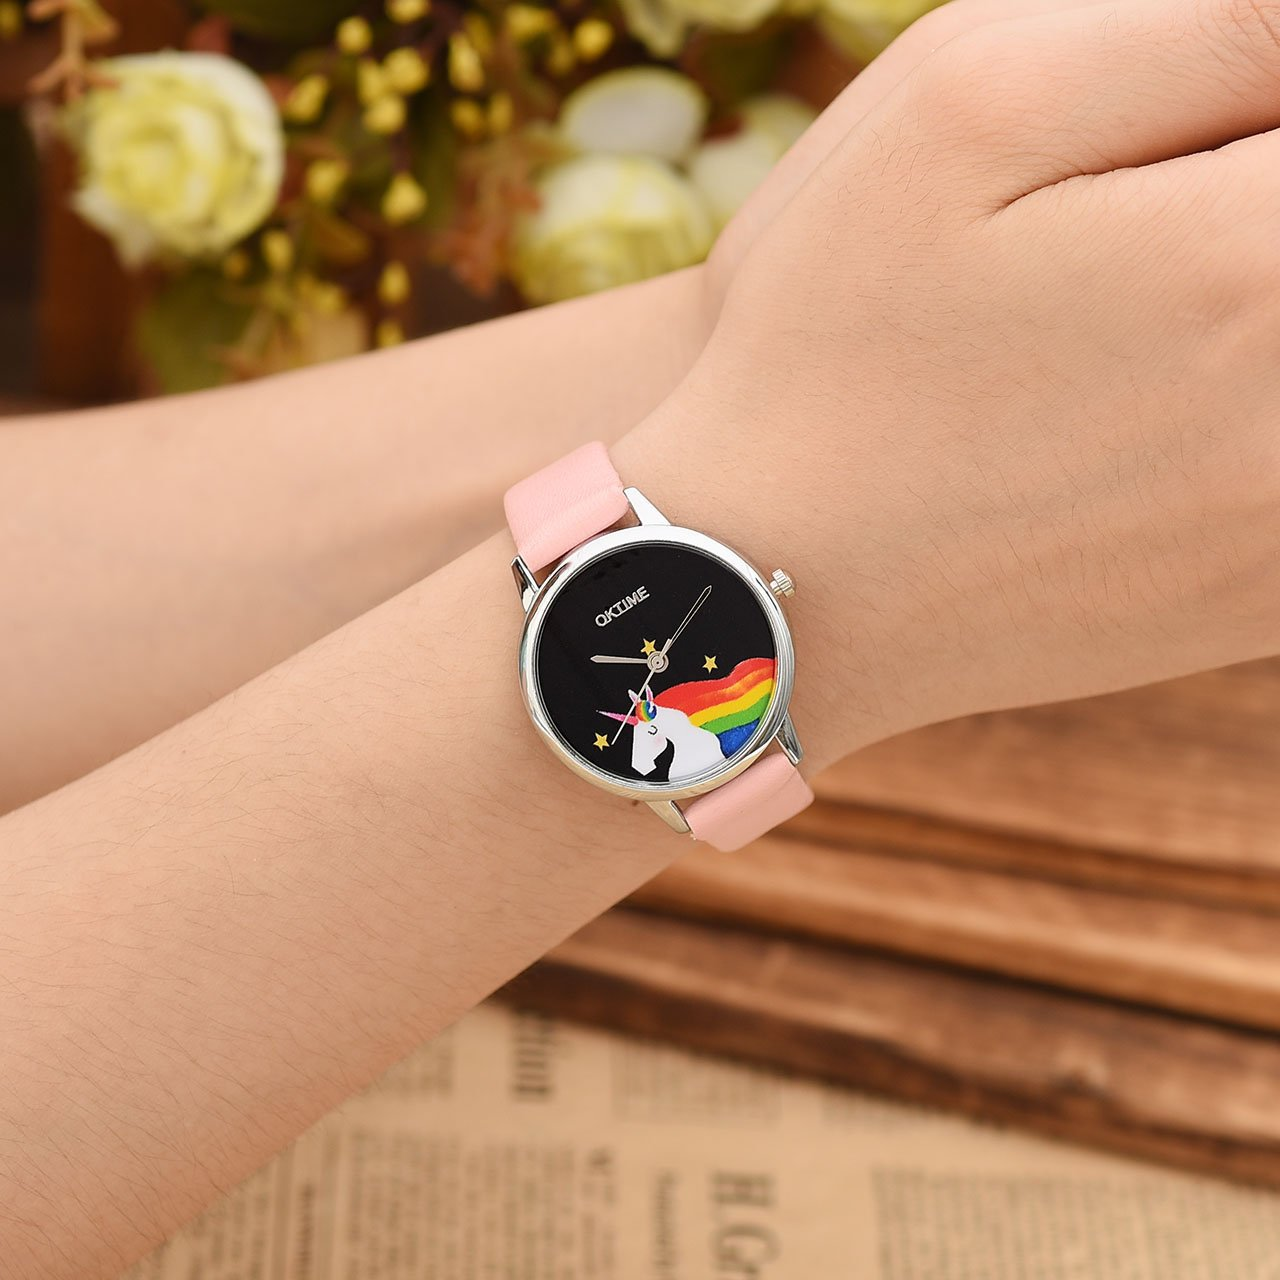 JSDDE Uhren, Cute Farbe Damen Armbanduhr Cartoon Einhorn Design Kleid Uhren Wasserdicht PU Lederband Silber Quarz Uhr,Rosa